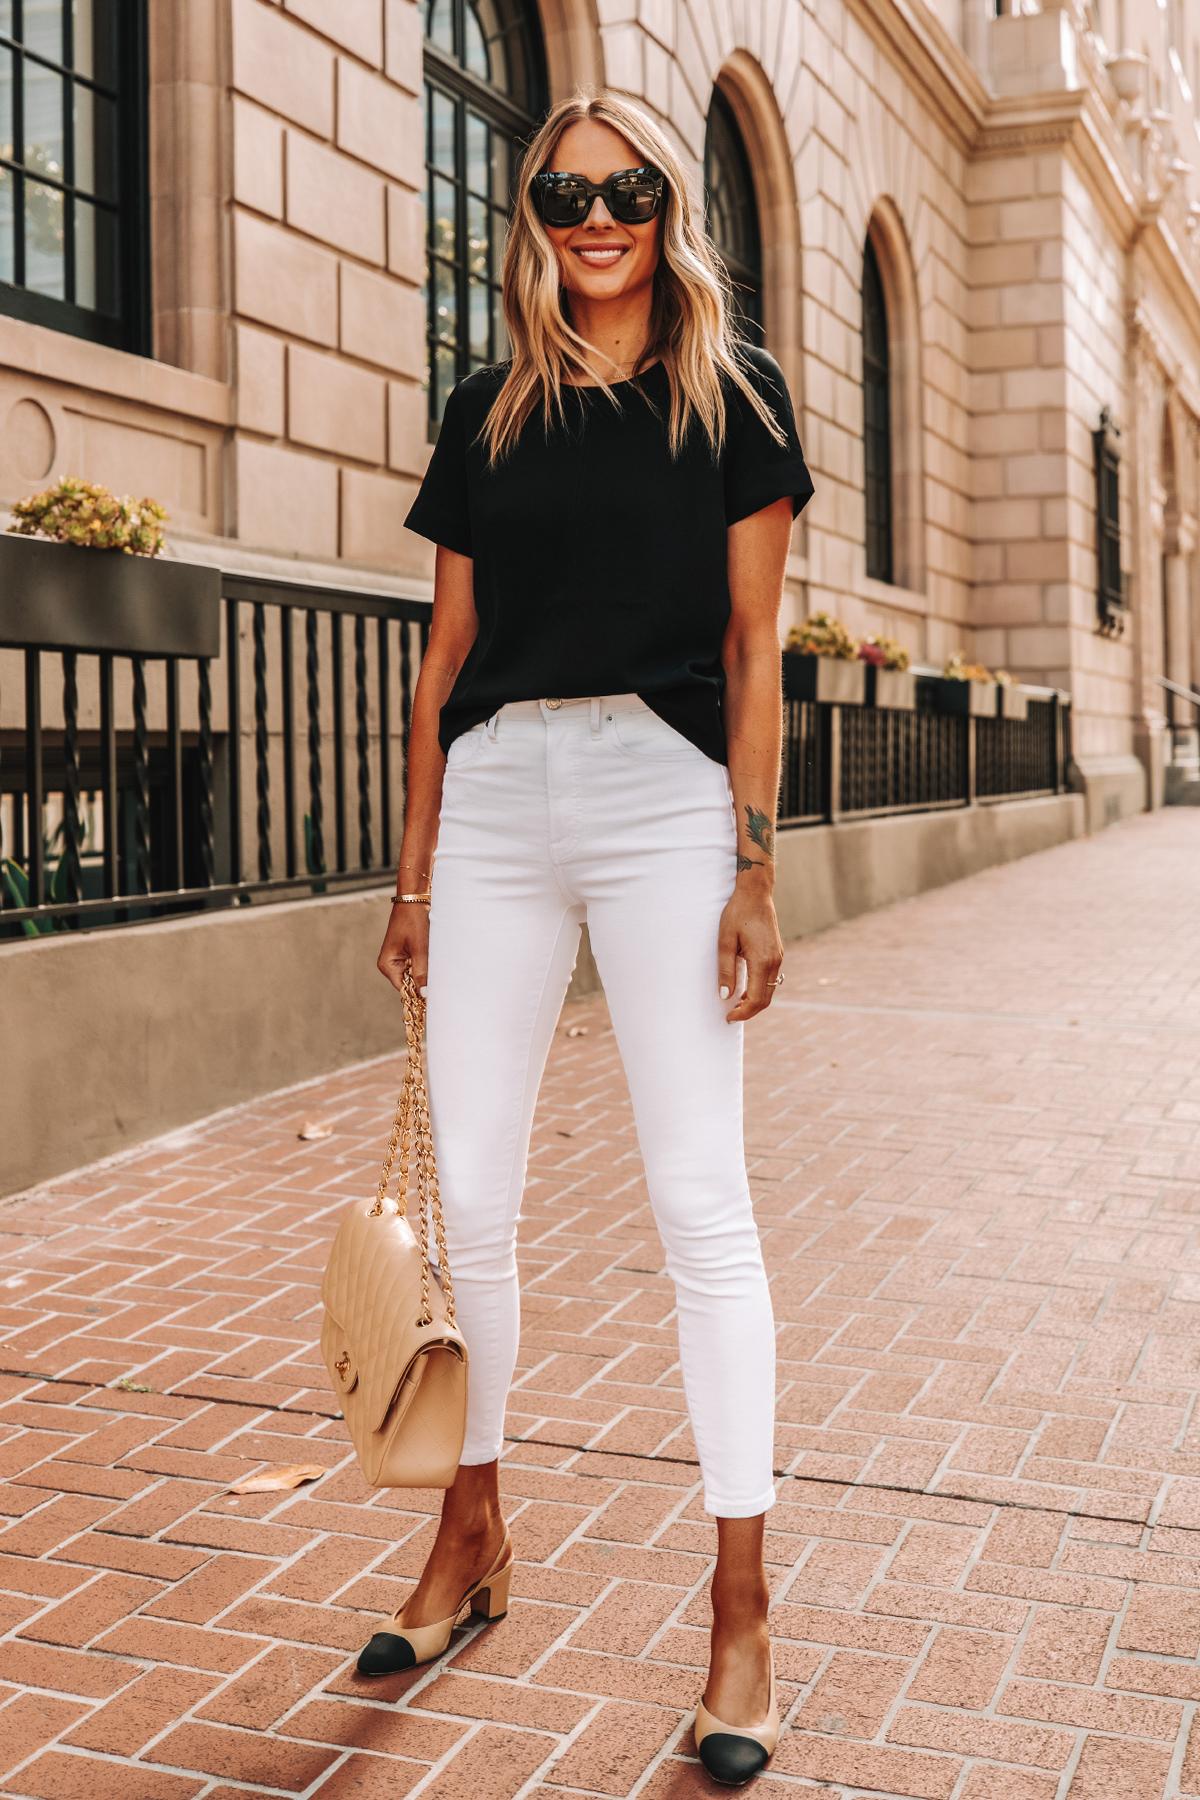 Fashion Jackson Wearing Everlane Black Short Sleeve Top Everlane White High Rise Skinny Jeans Chanel Slingbacks Chanel Beige Handbag